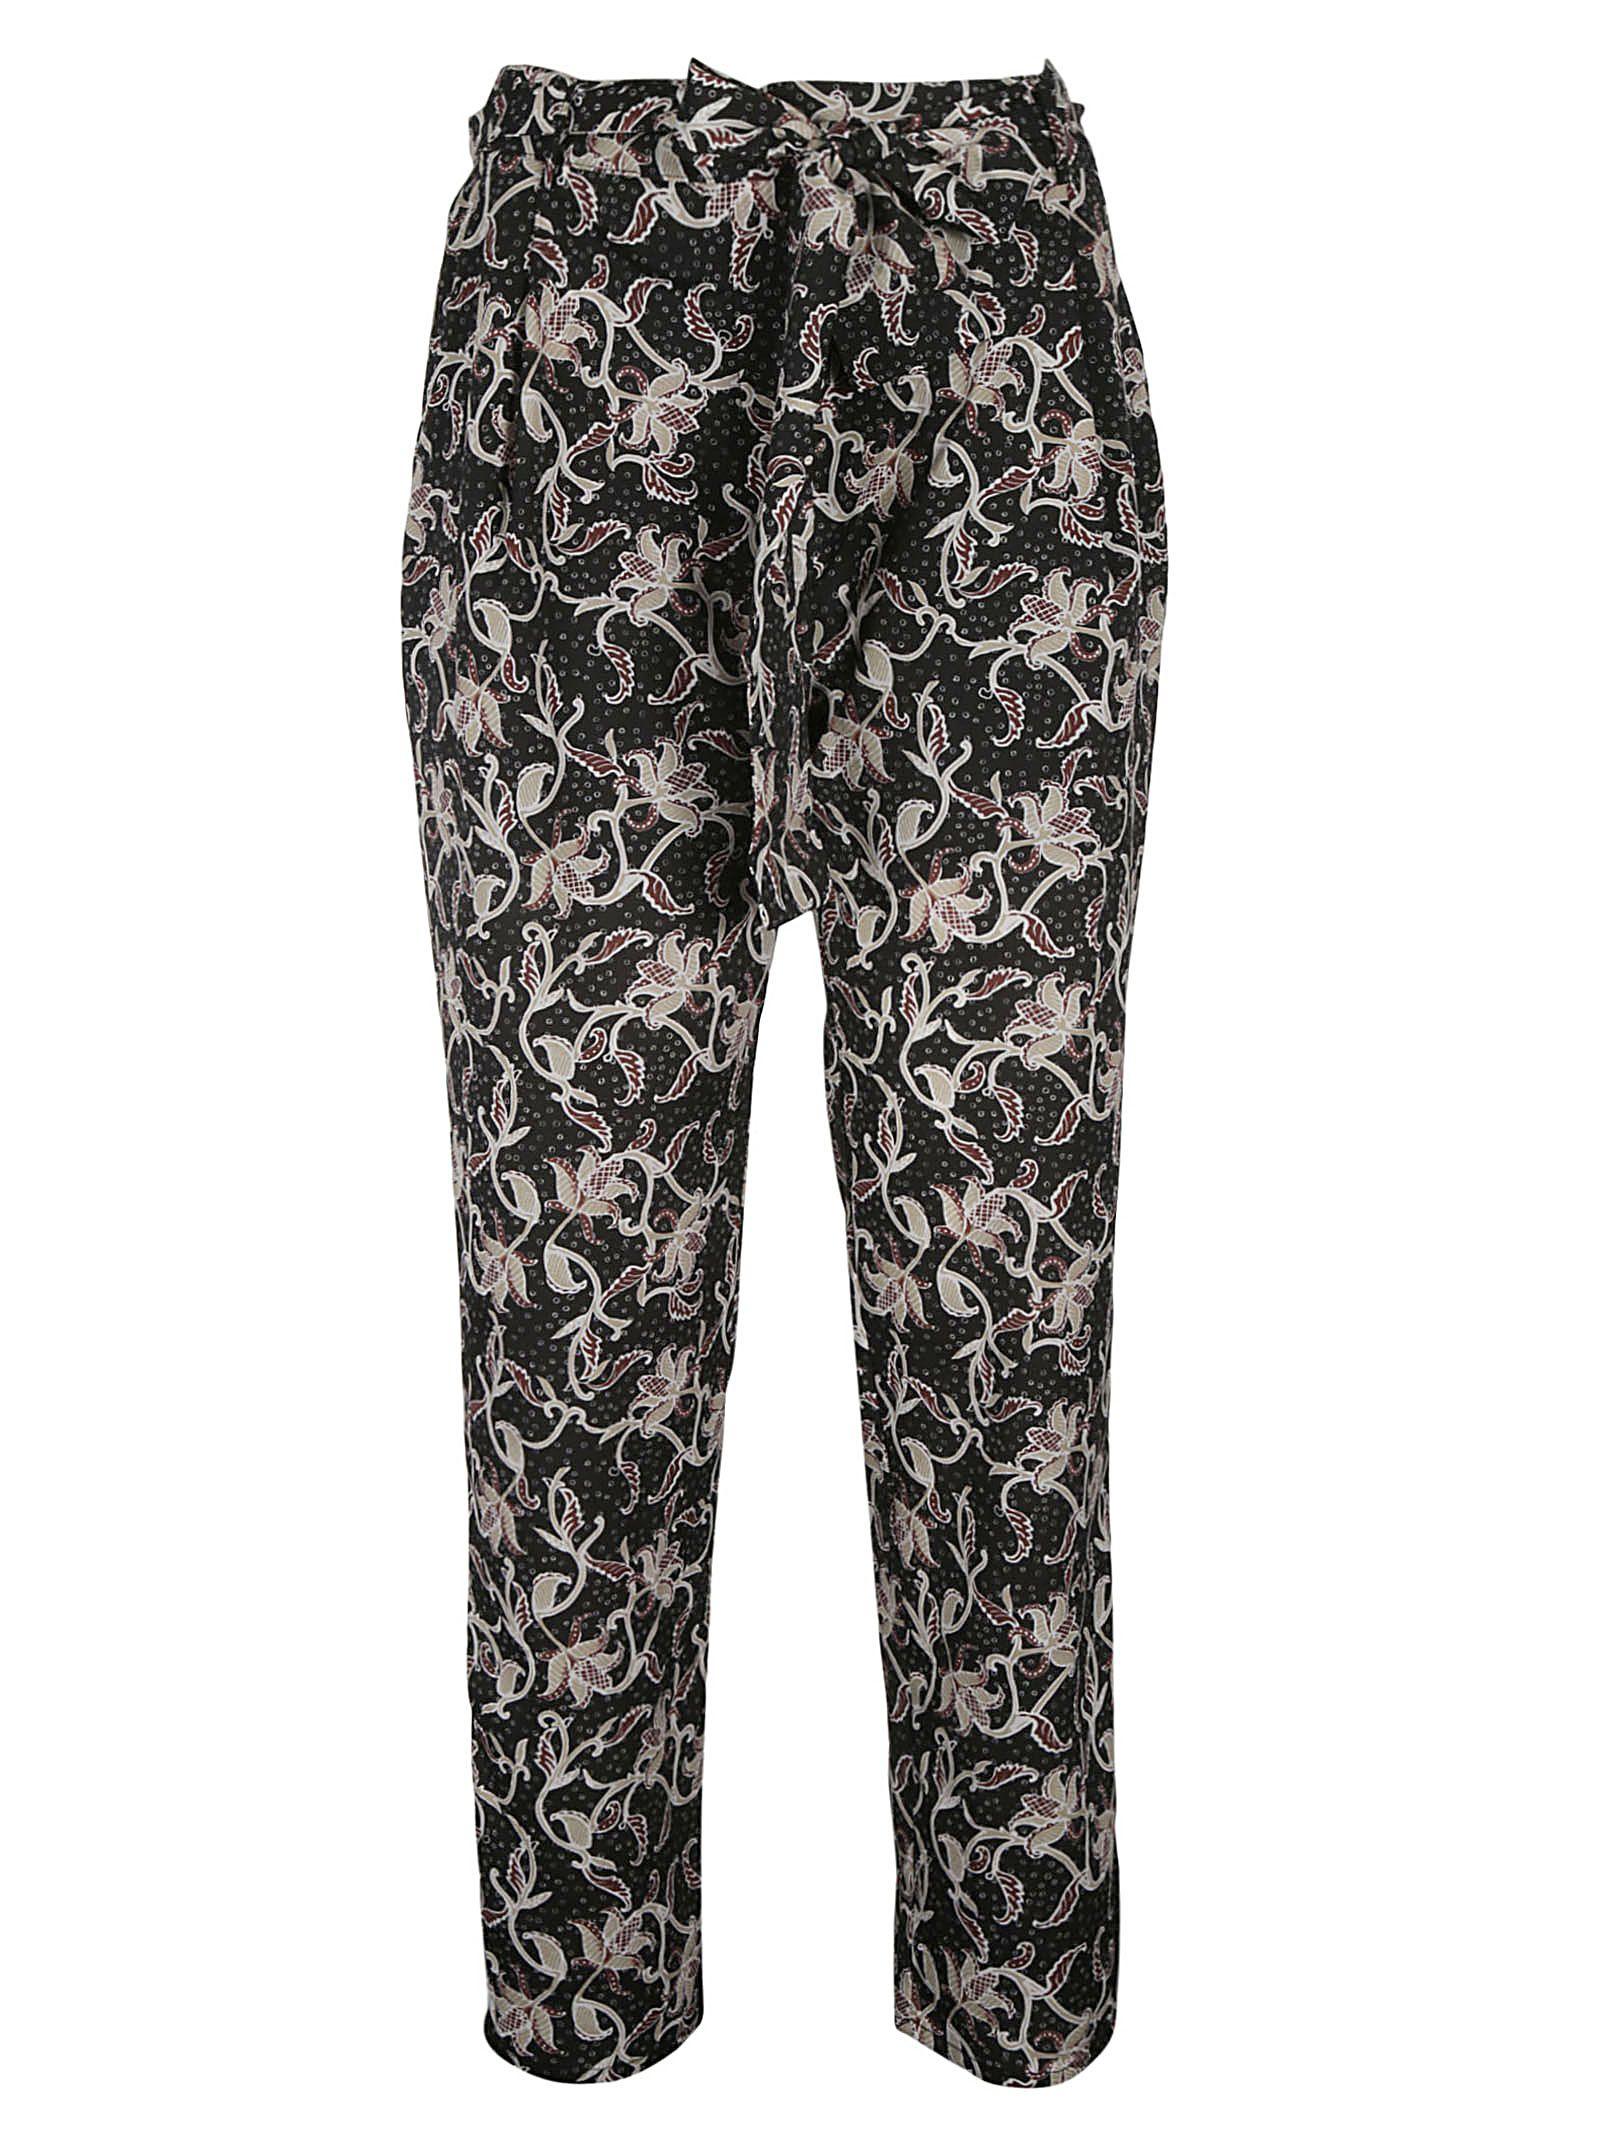 Pinko Pants PINKO WOMEN'S BLACK POLYESTER PANTS